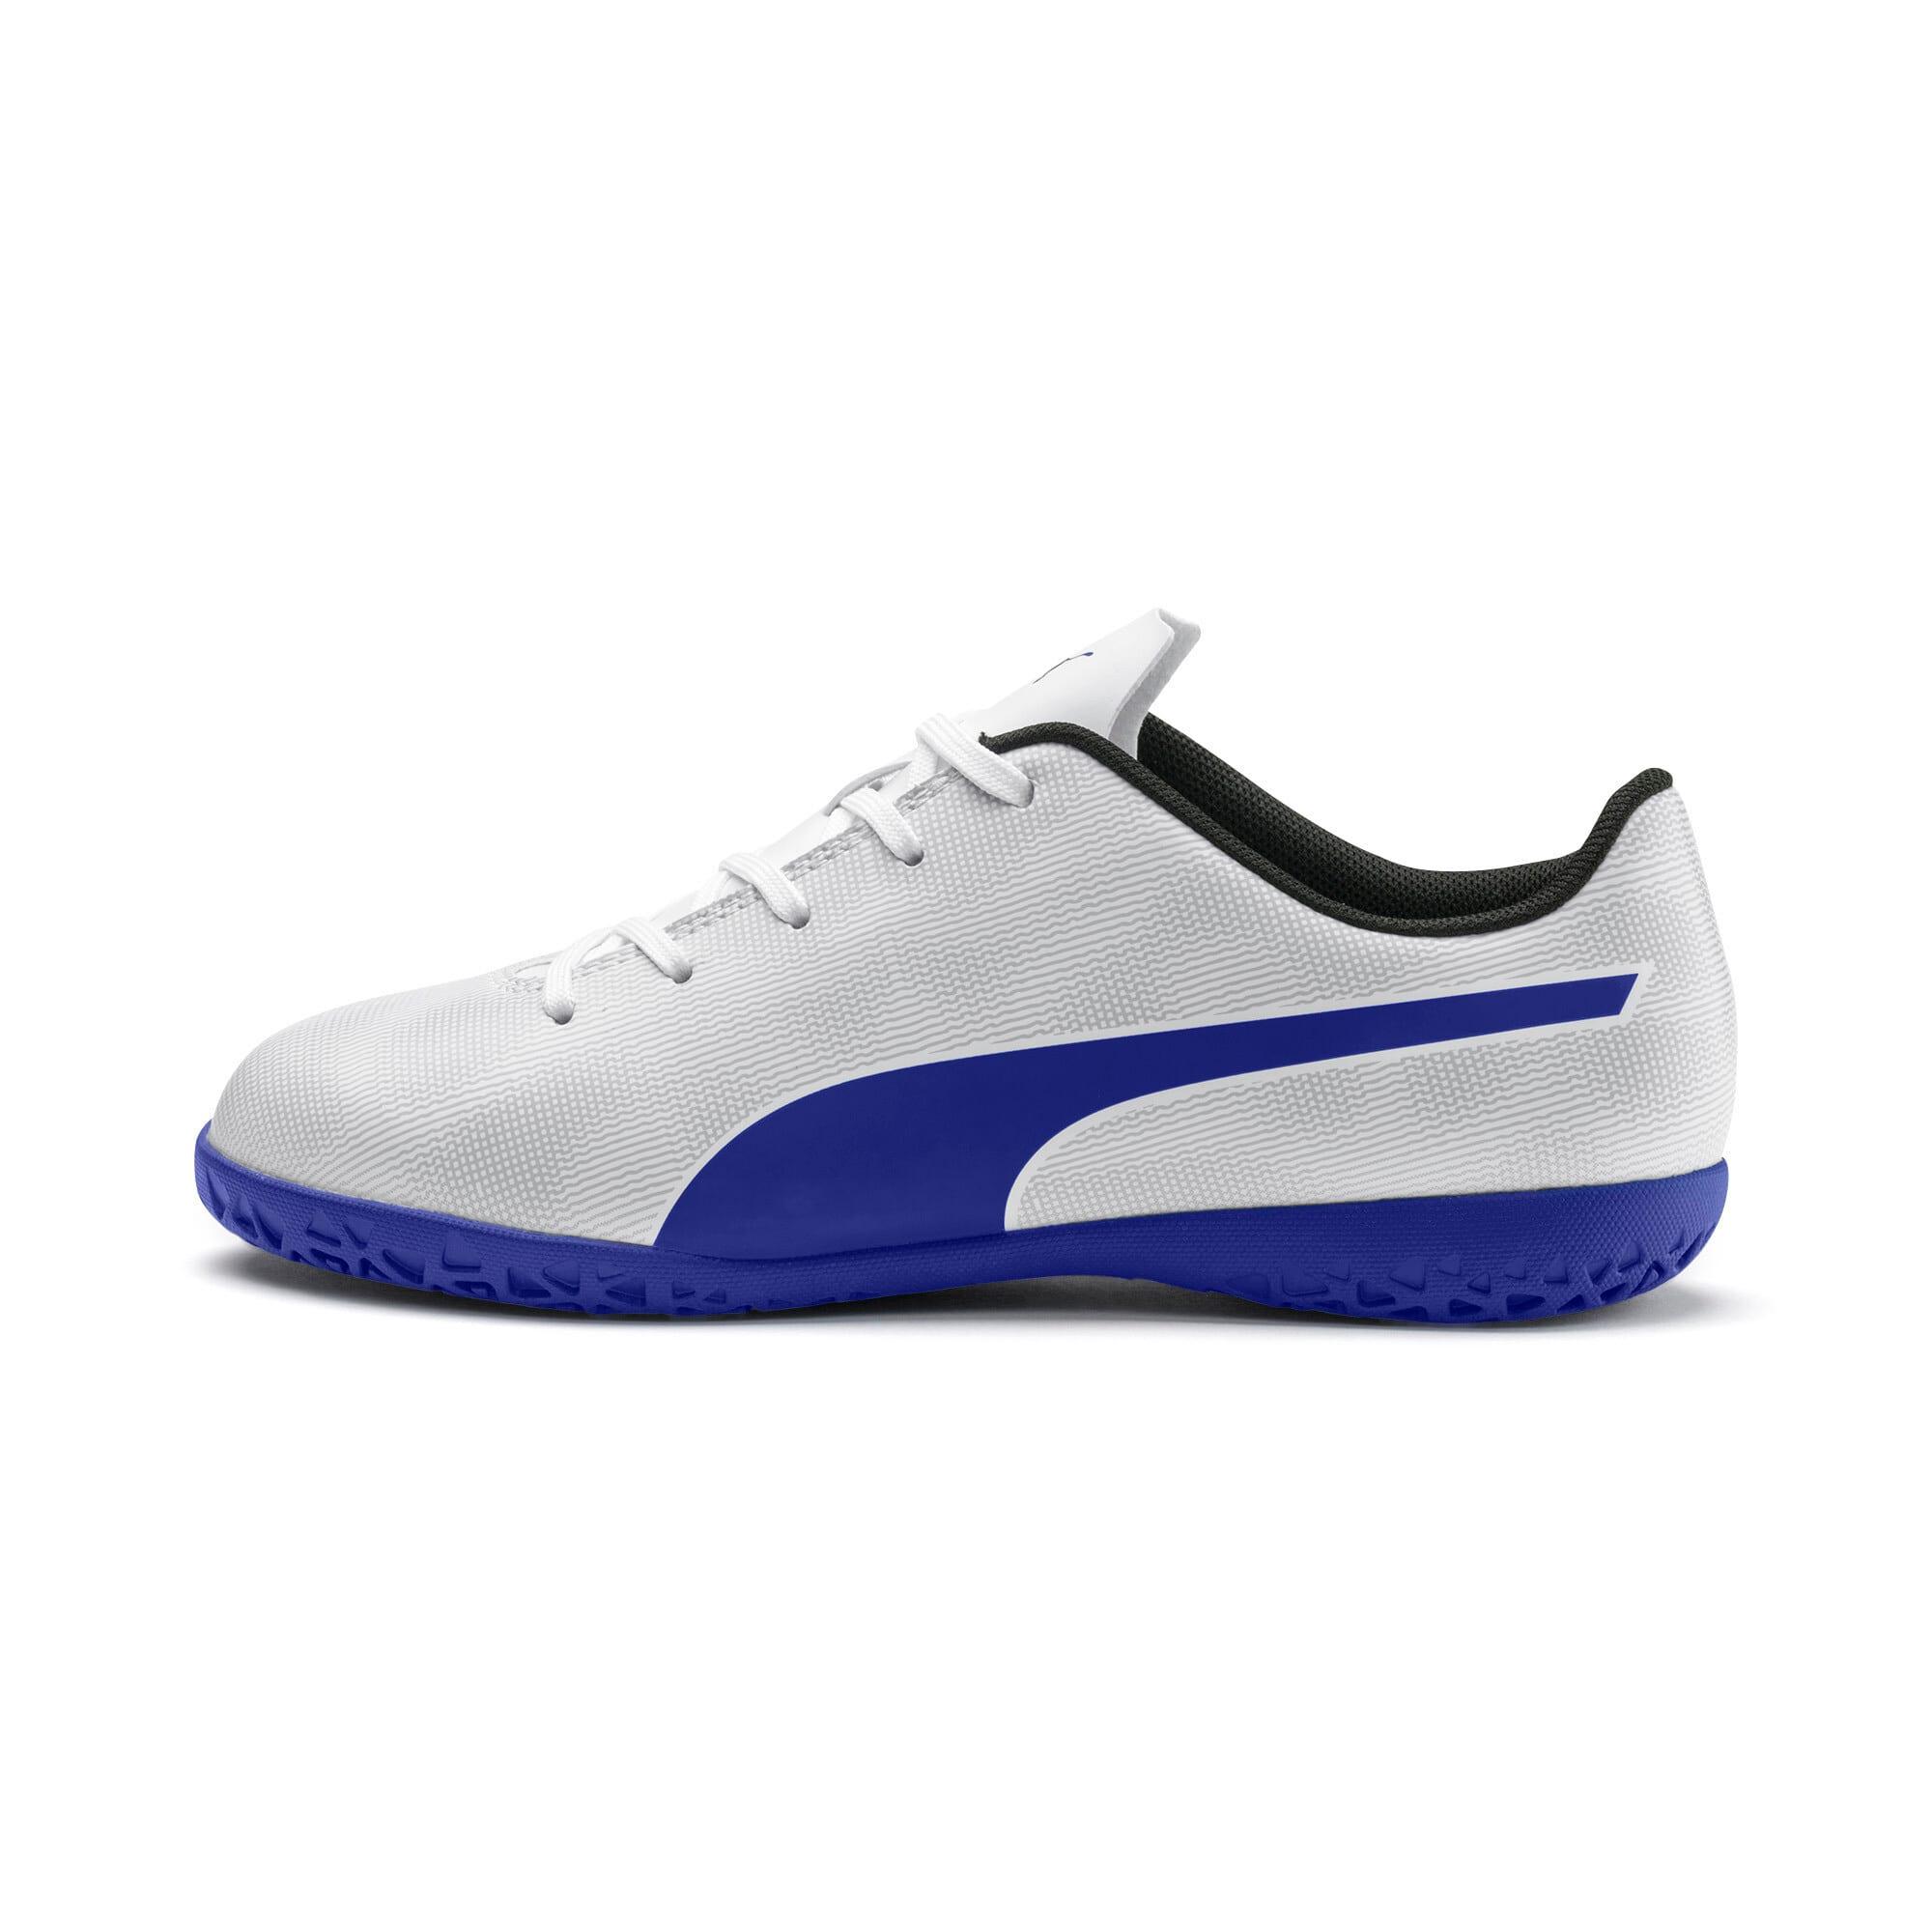 Thumbnail 1 of Rapido IT Boy's Soccer Shoes JR, White-Royal Blue-Light Gray, medium